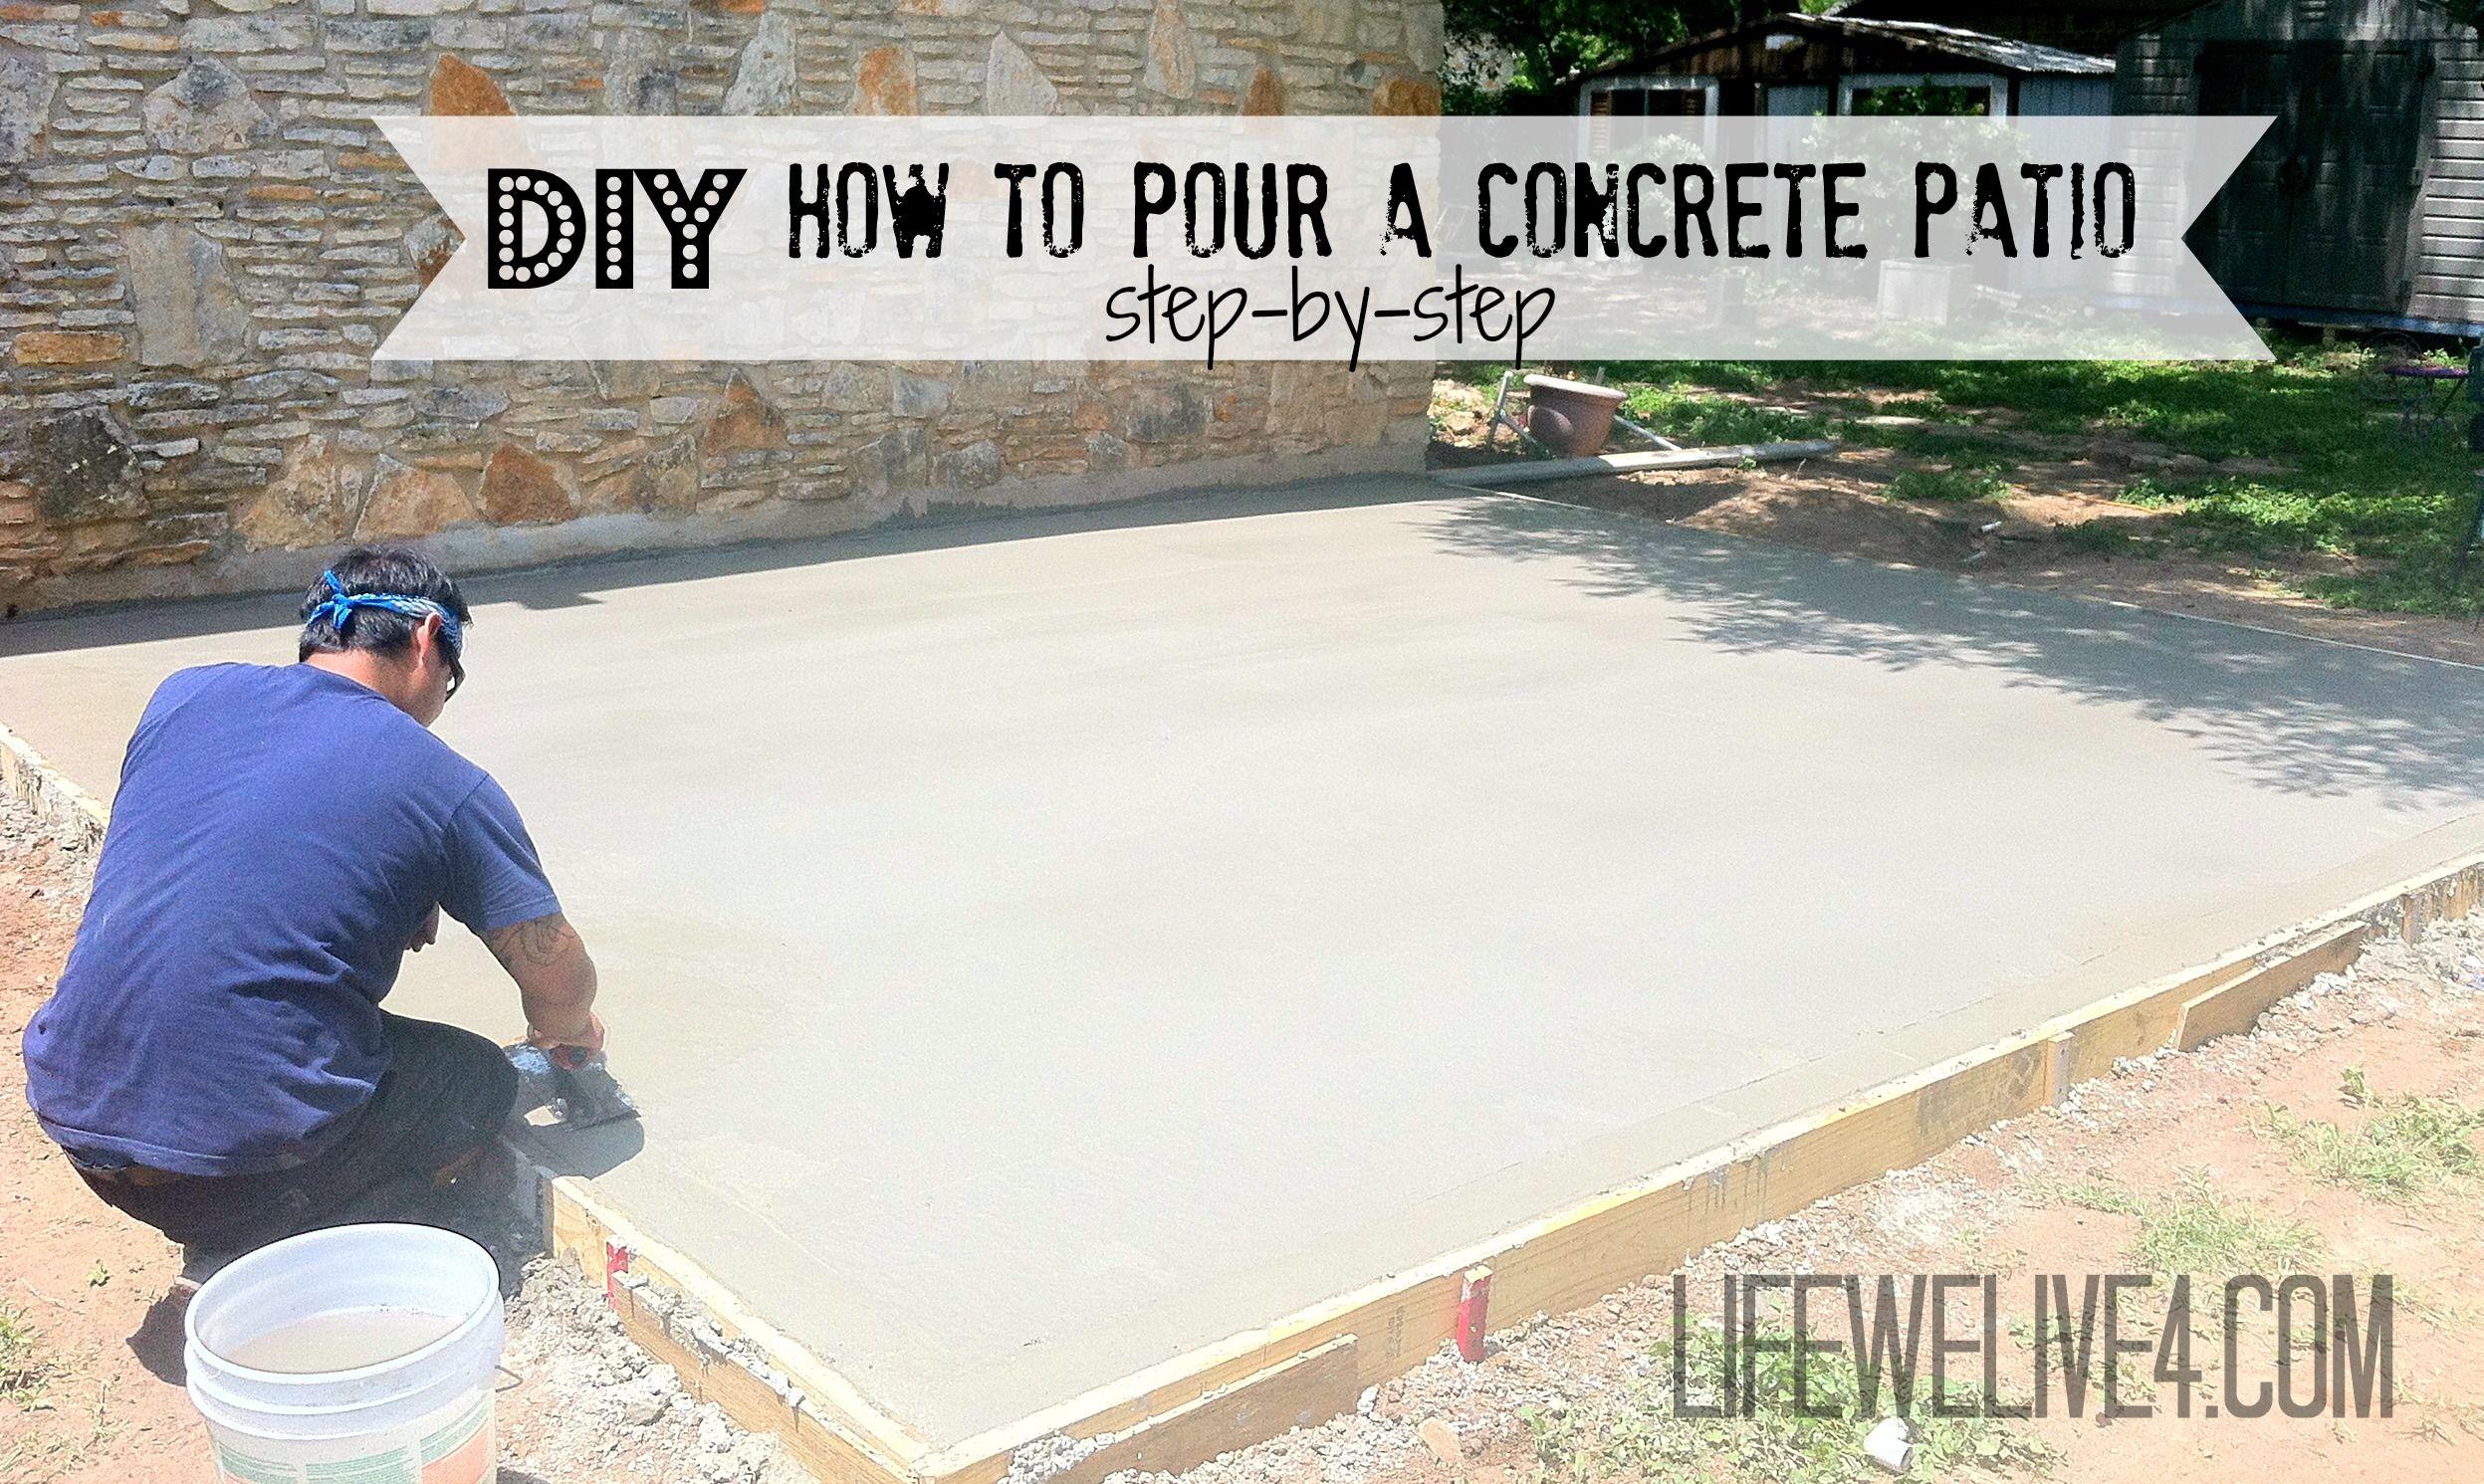 diy concrete patio DIY How To Pour a Concrete Patio